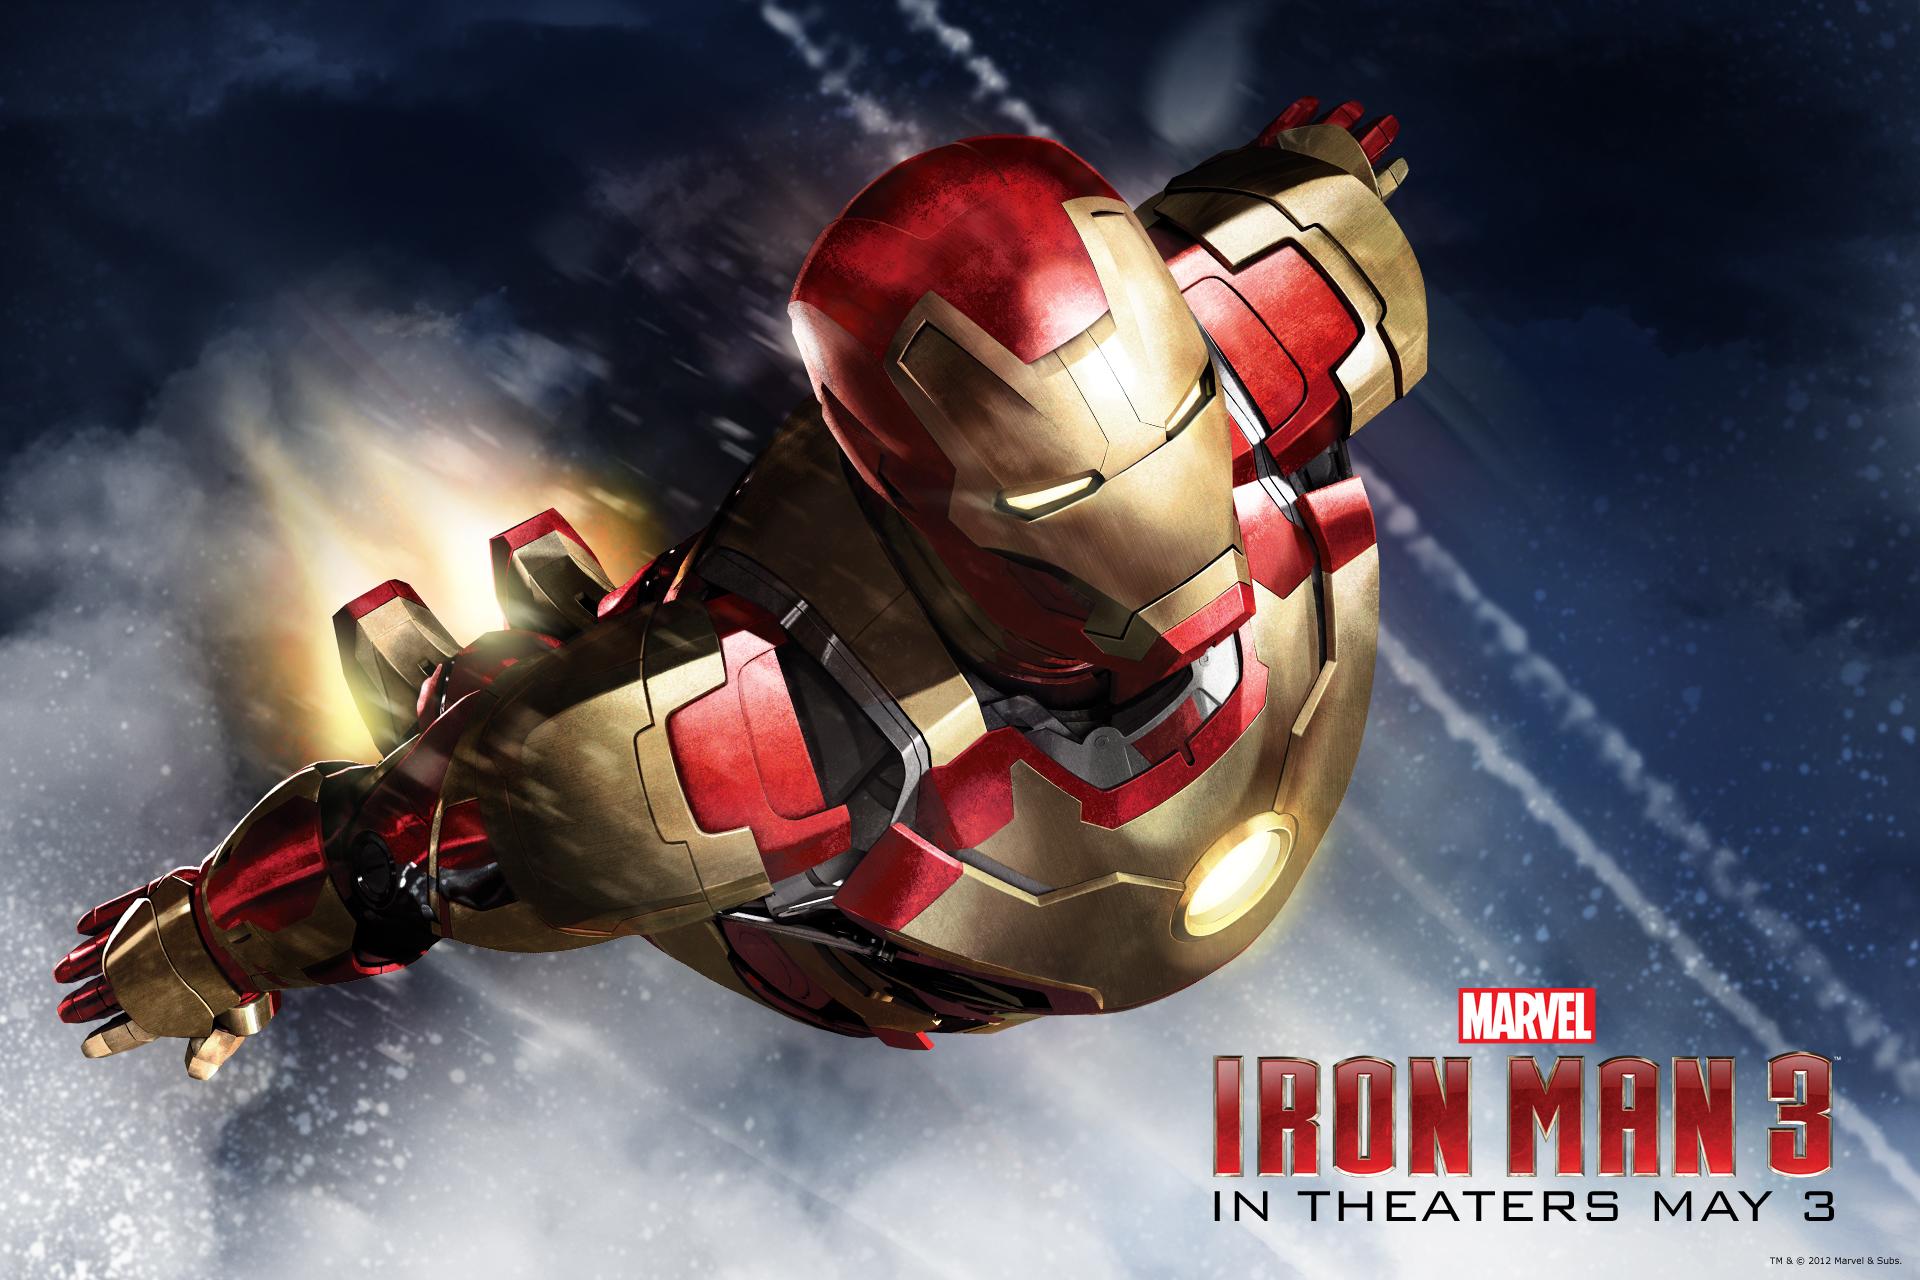 Gta Sa Iron Man Flight Mod